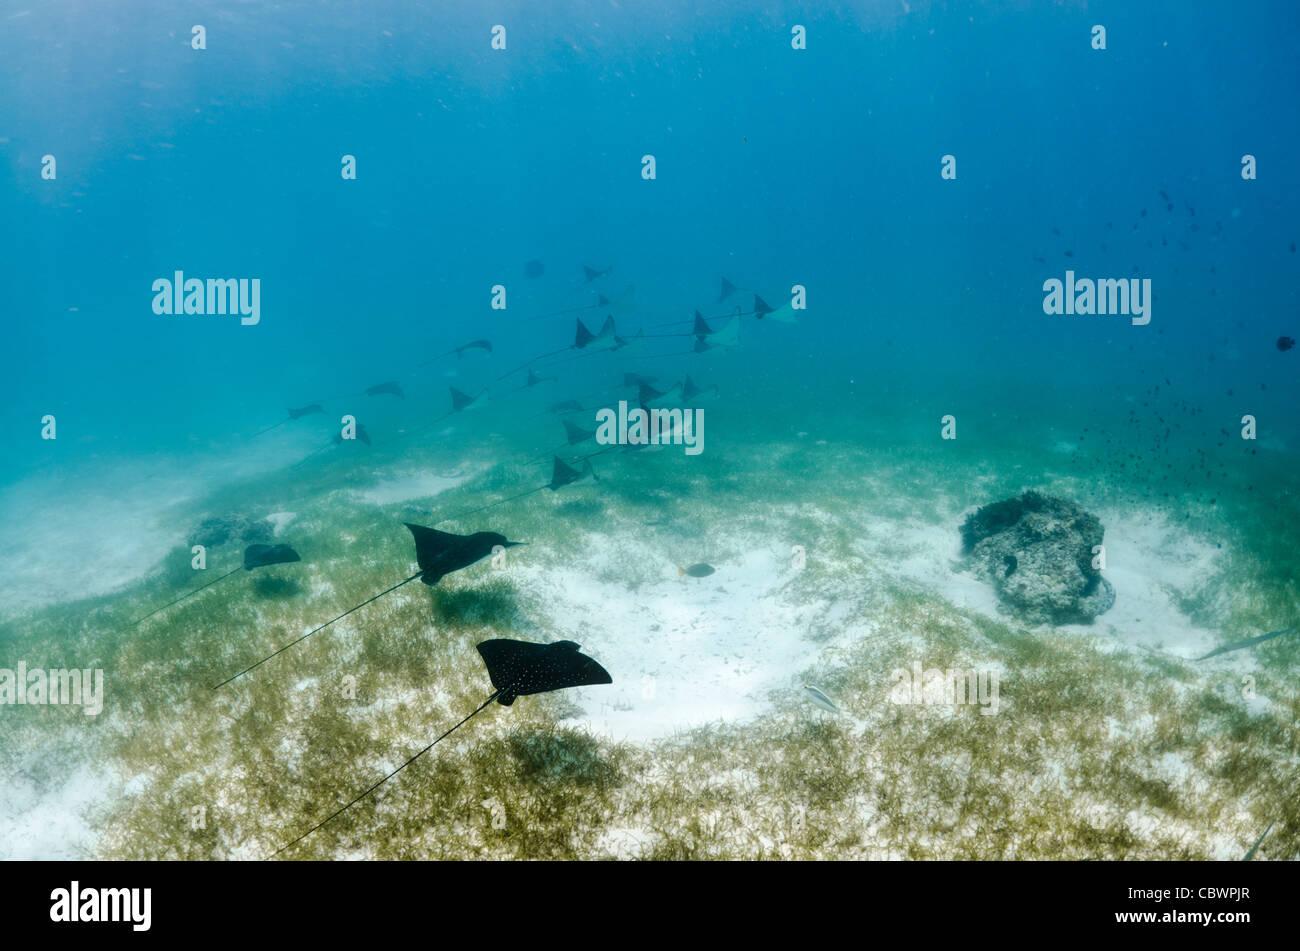 Schooling spotted eagle rays, Aetobatus narinari, Seychelles - Stock Image